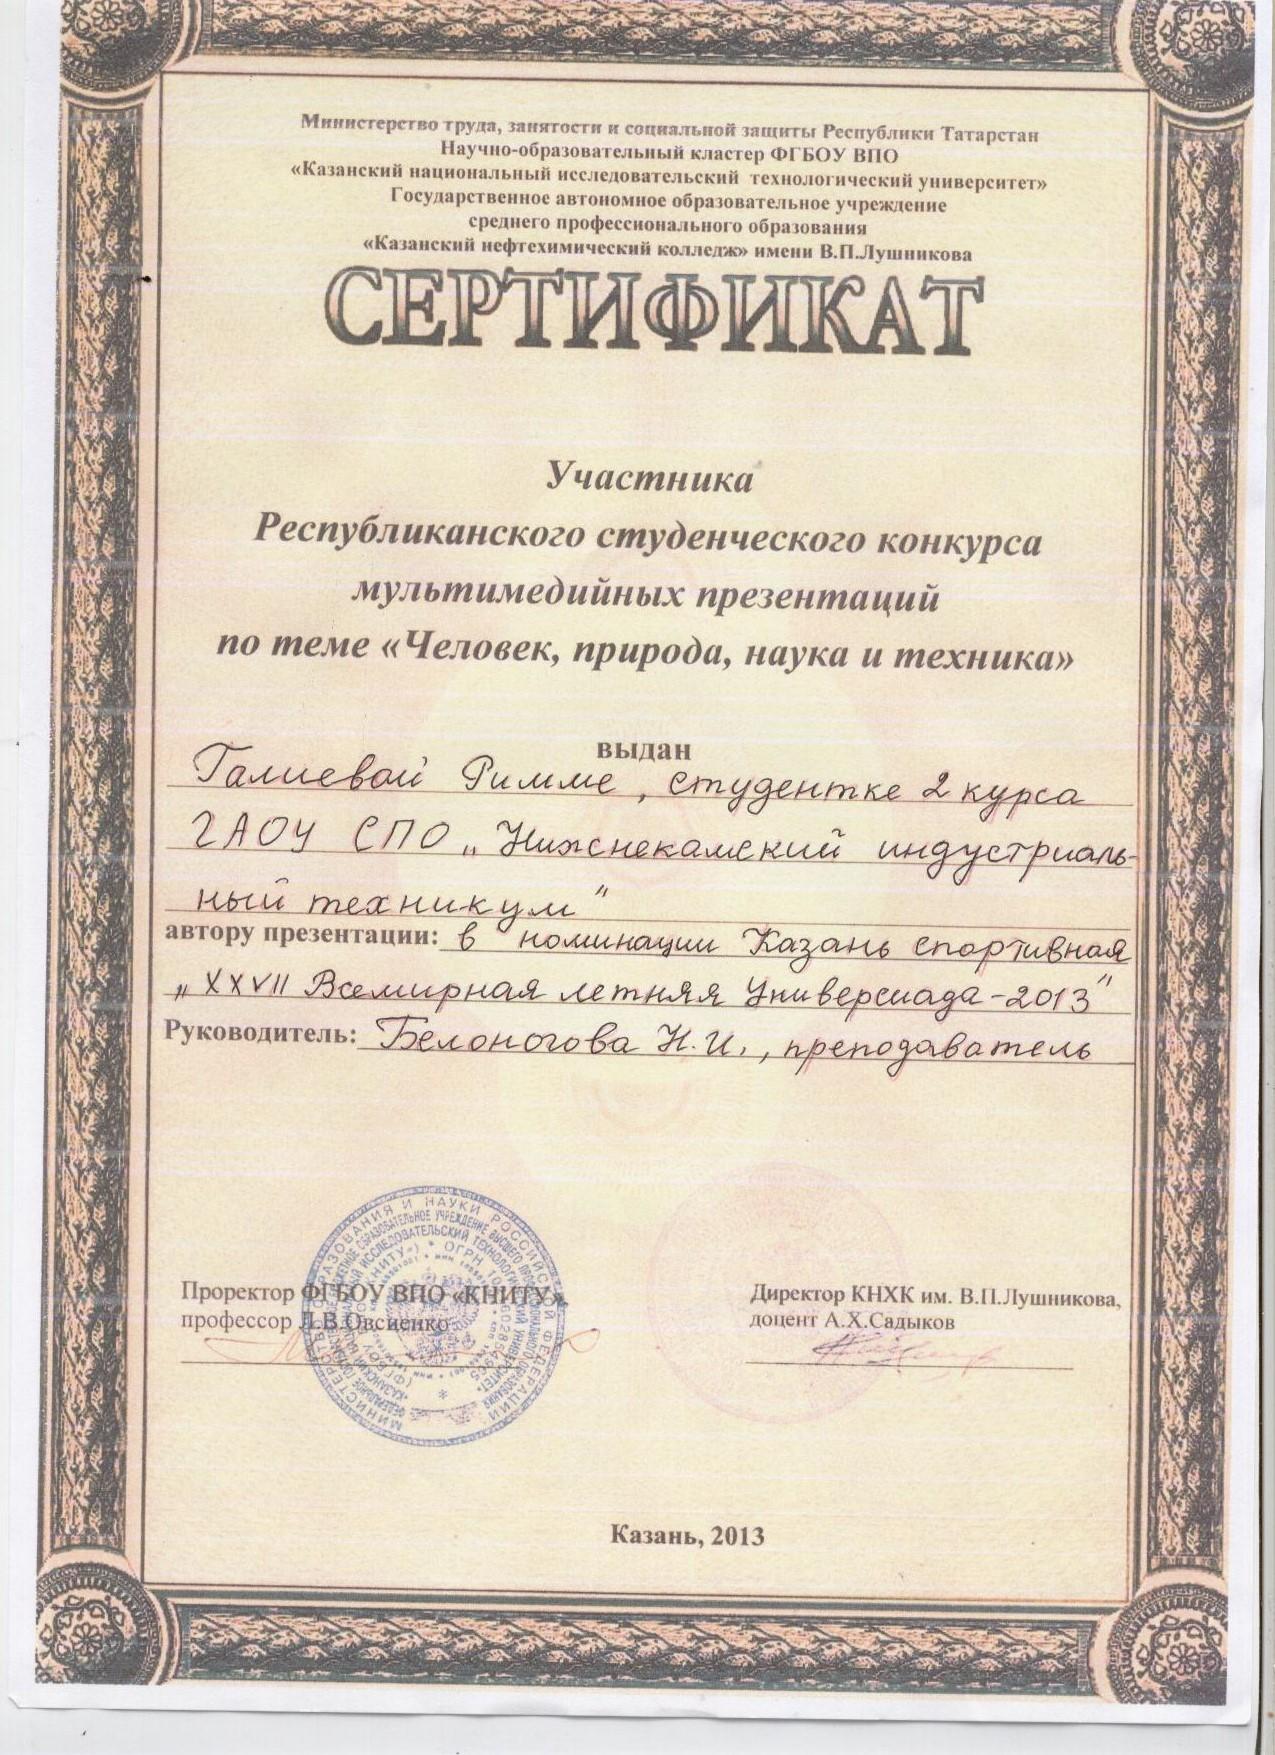 F:\Всероссйский конкурс Портфолио выпускника\РИММА\Римма 002.jpg